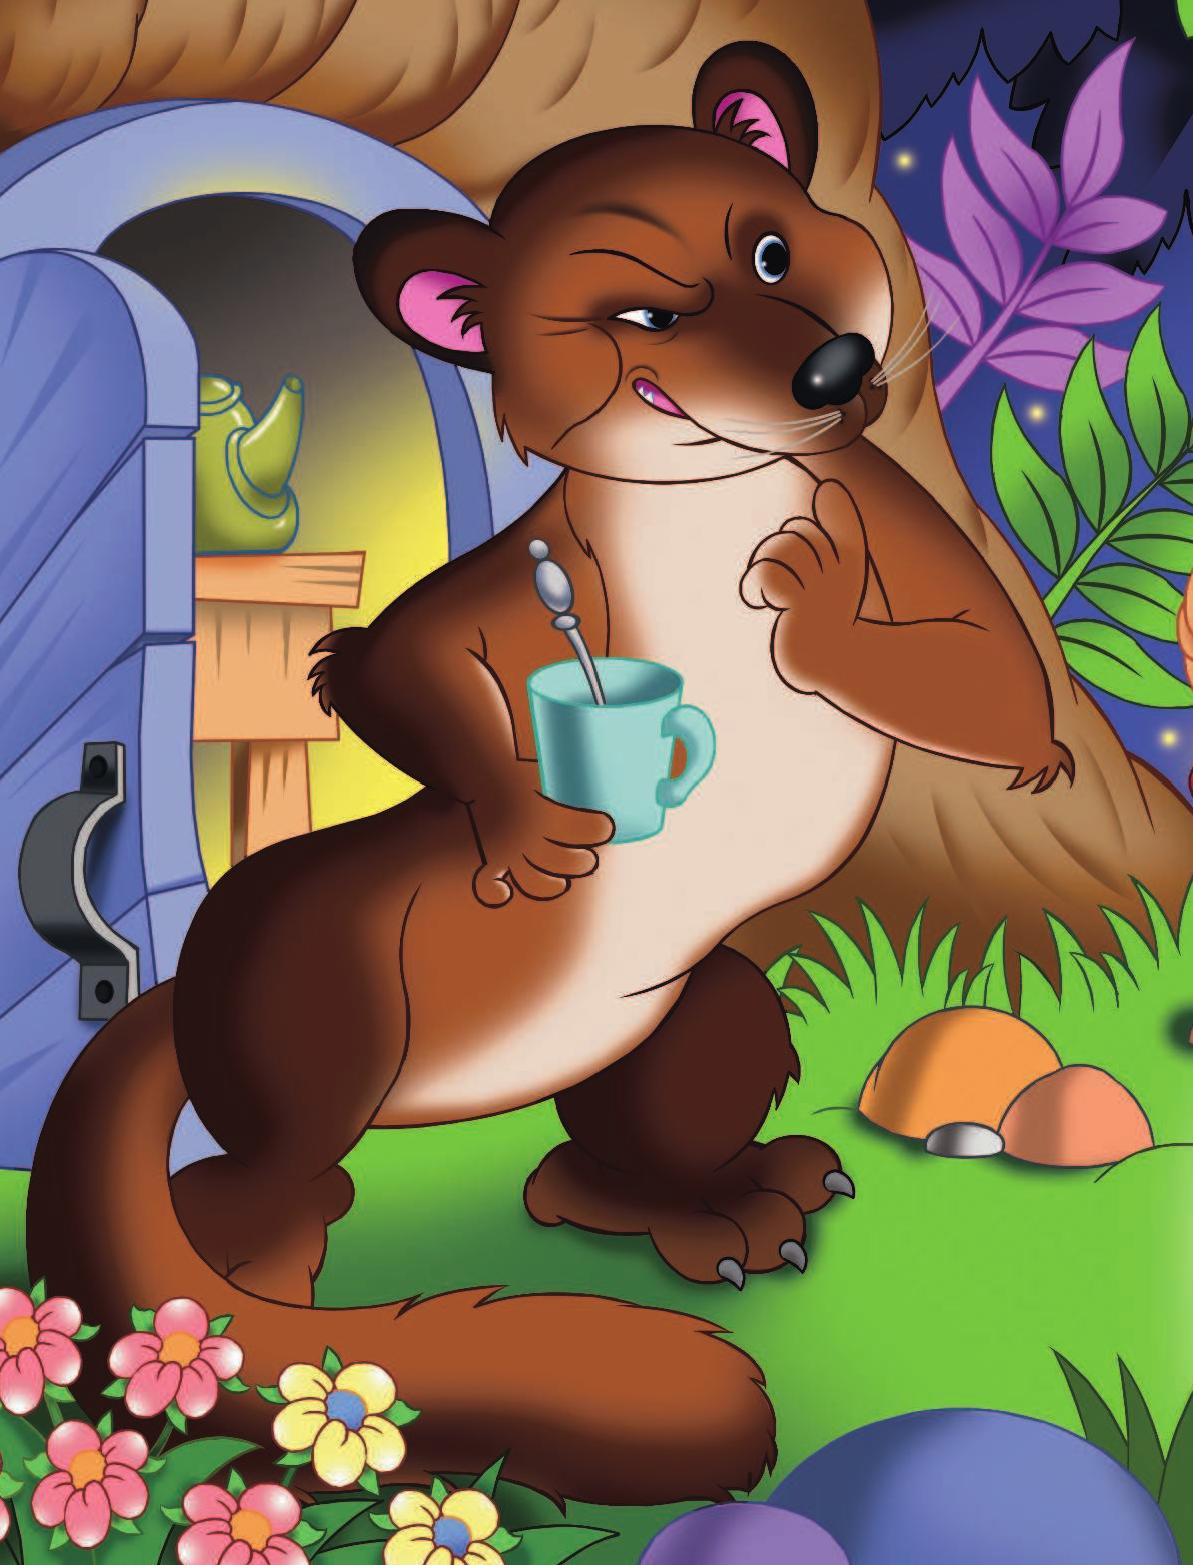 стандартизация, картинка медвежонка сказочного вообще какого-то момента